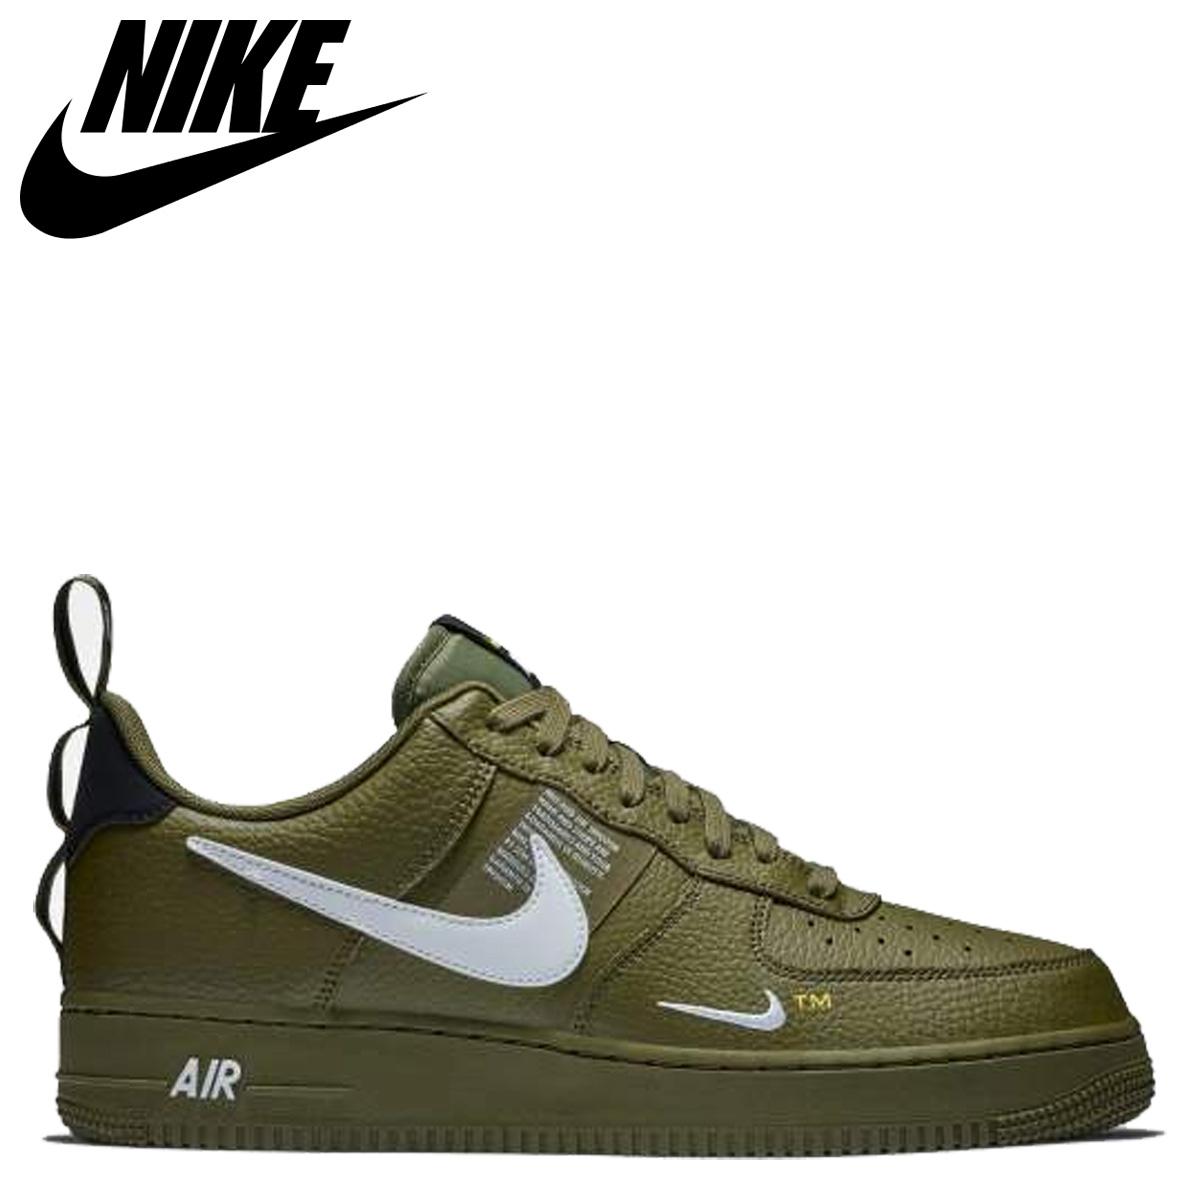 Nike NIKE air force 1 sneakers men AIR FORCE 1 07 LV8 UTILITY olive AJ7747 300